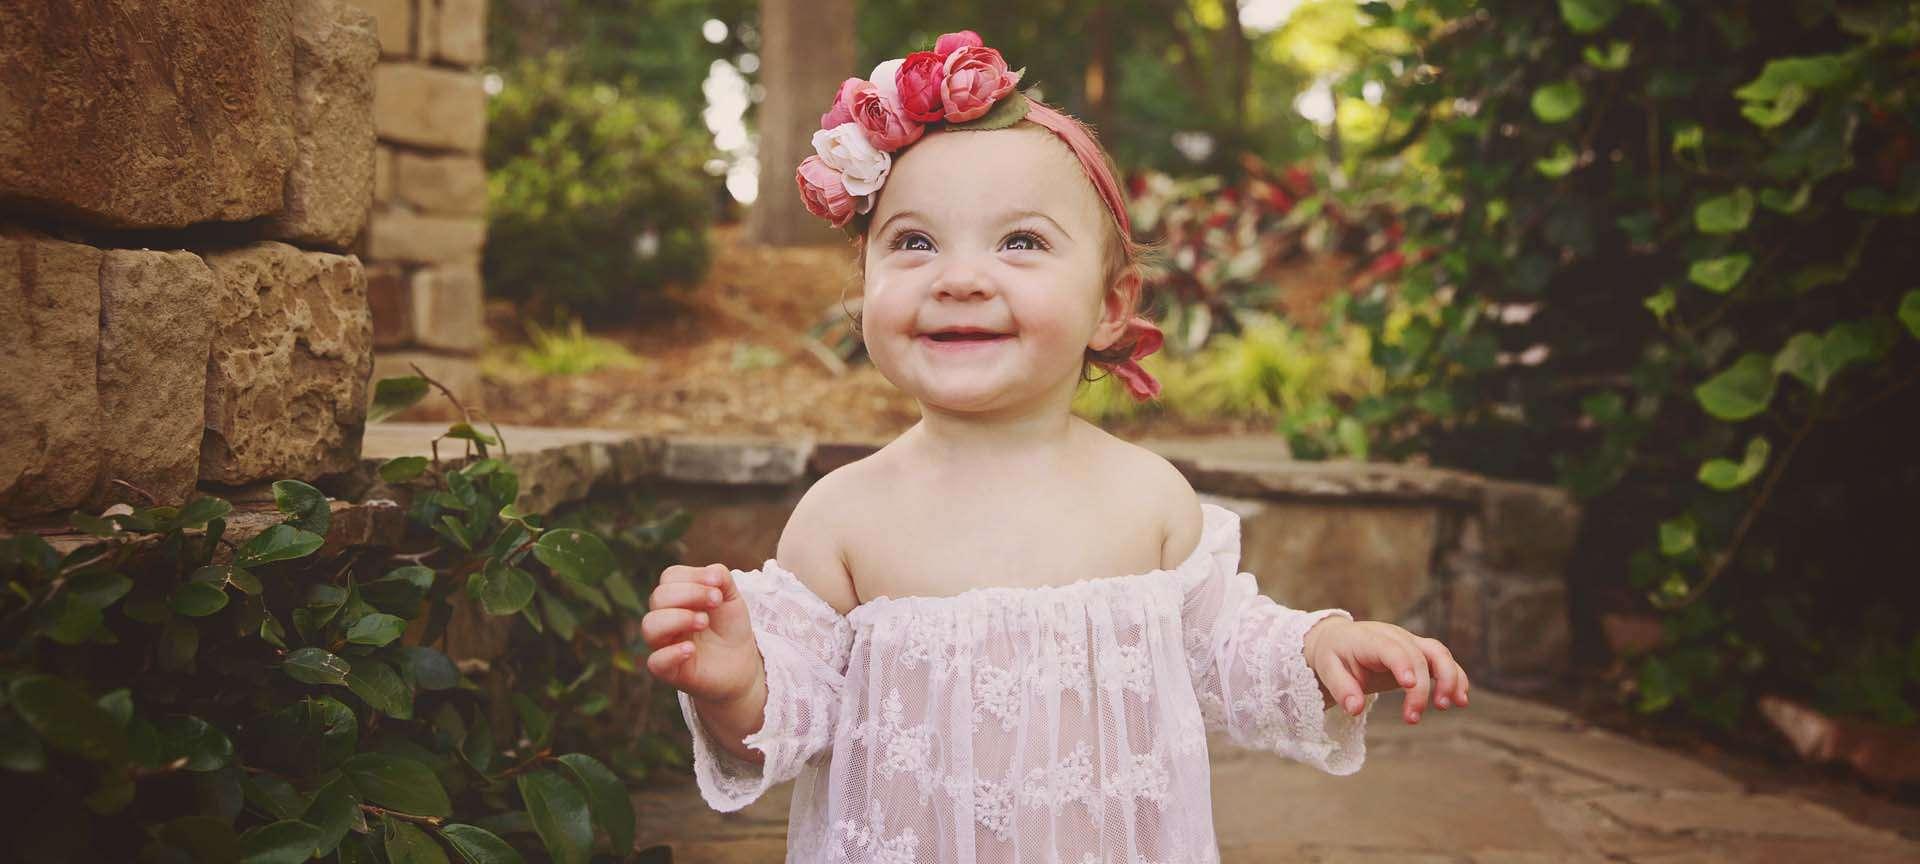 Grapevine Baby Photographer